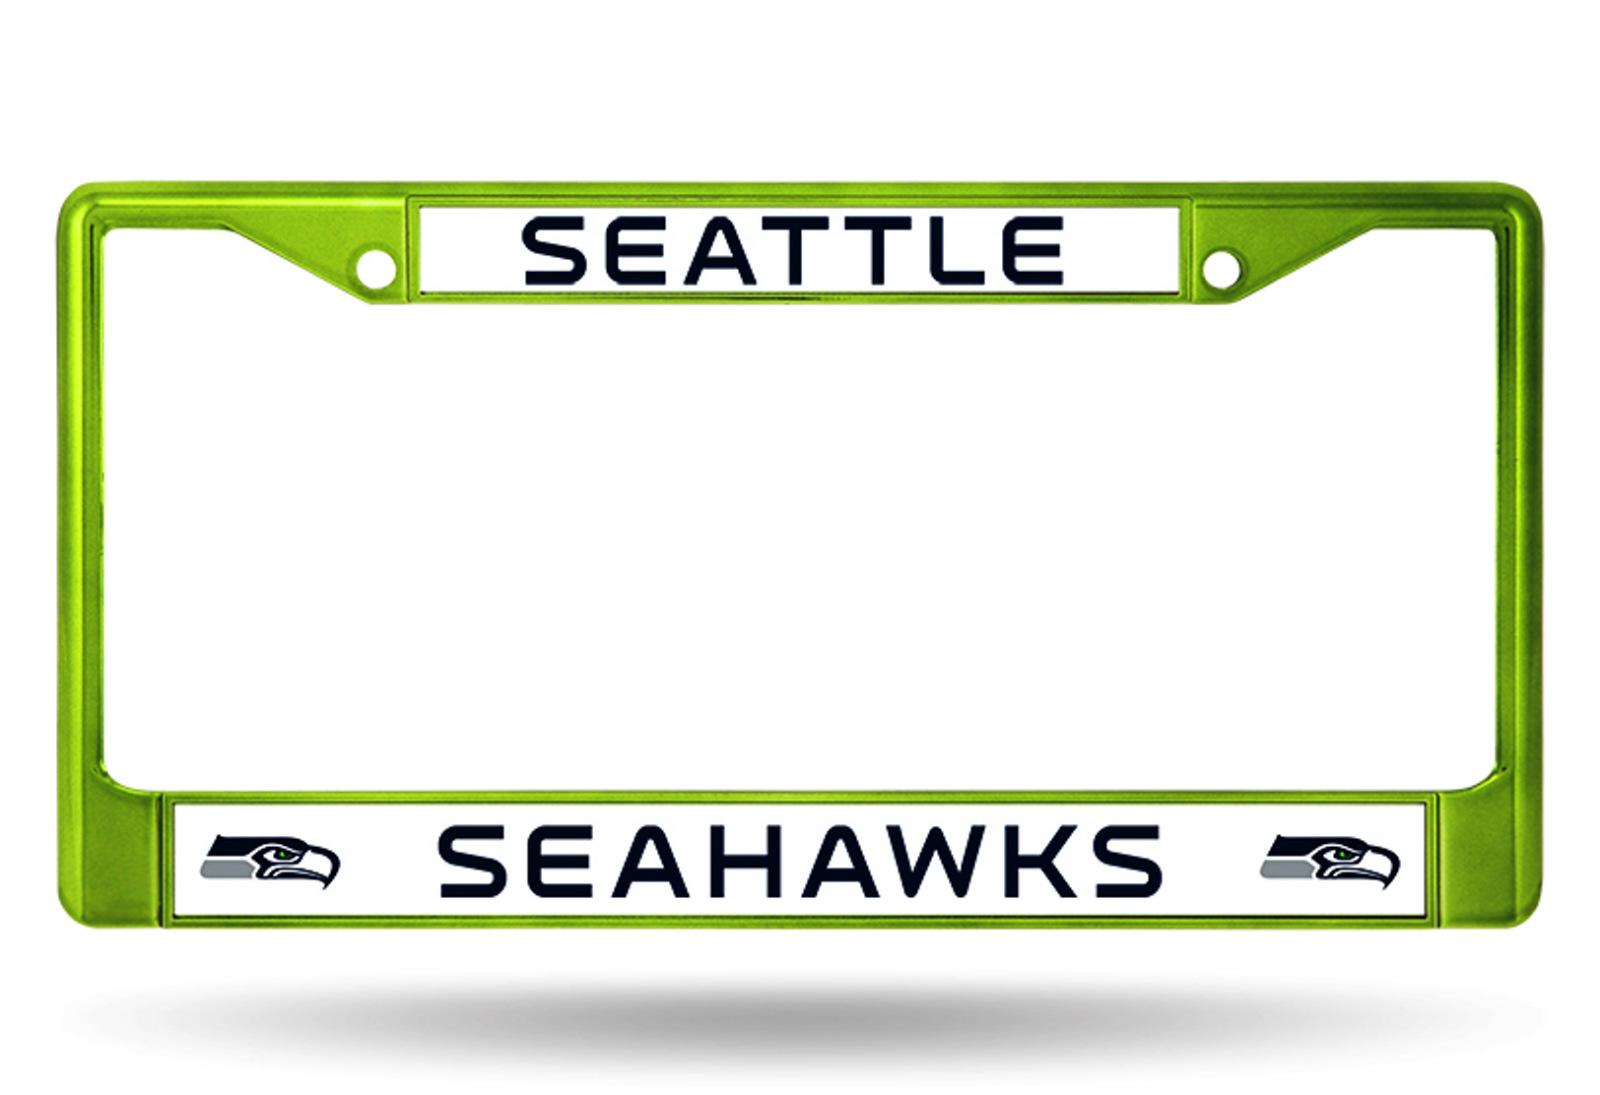 Seattle seahawks green frame metal chrome license plate tag cover seattle seahawks green frame metal chrome license plate tag cover football jeuxipadfo Choice Image